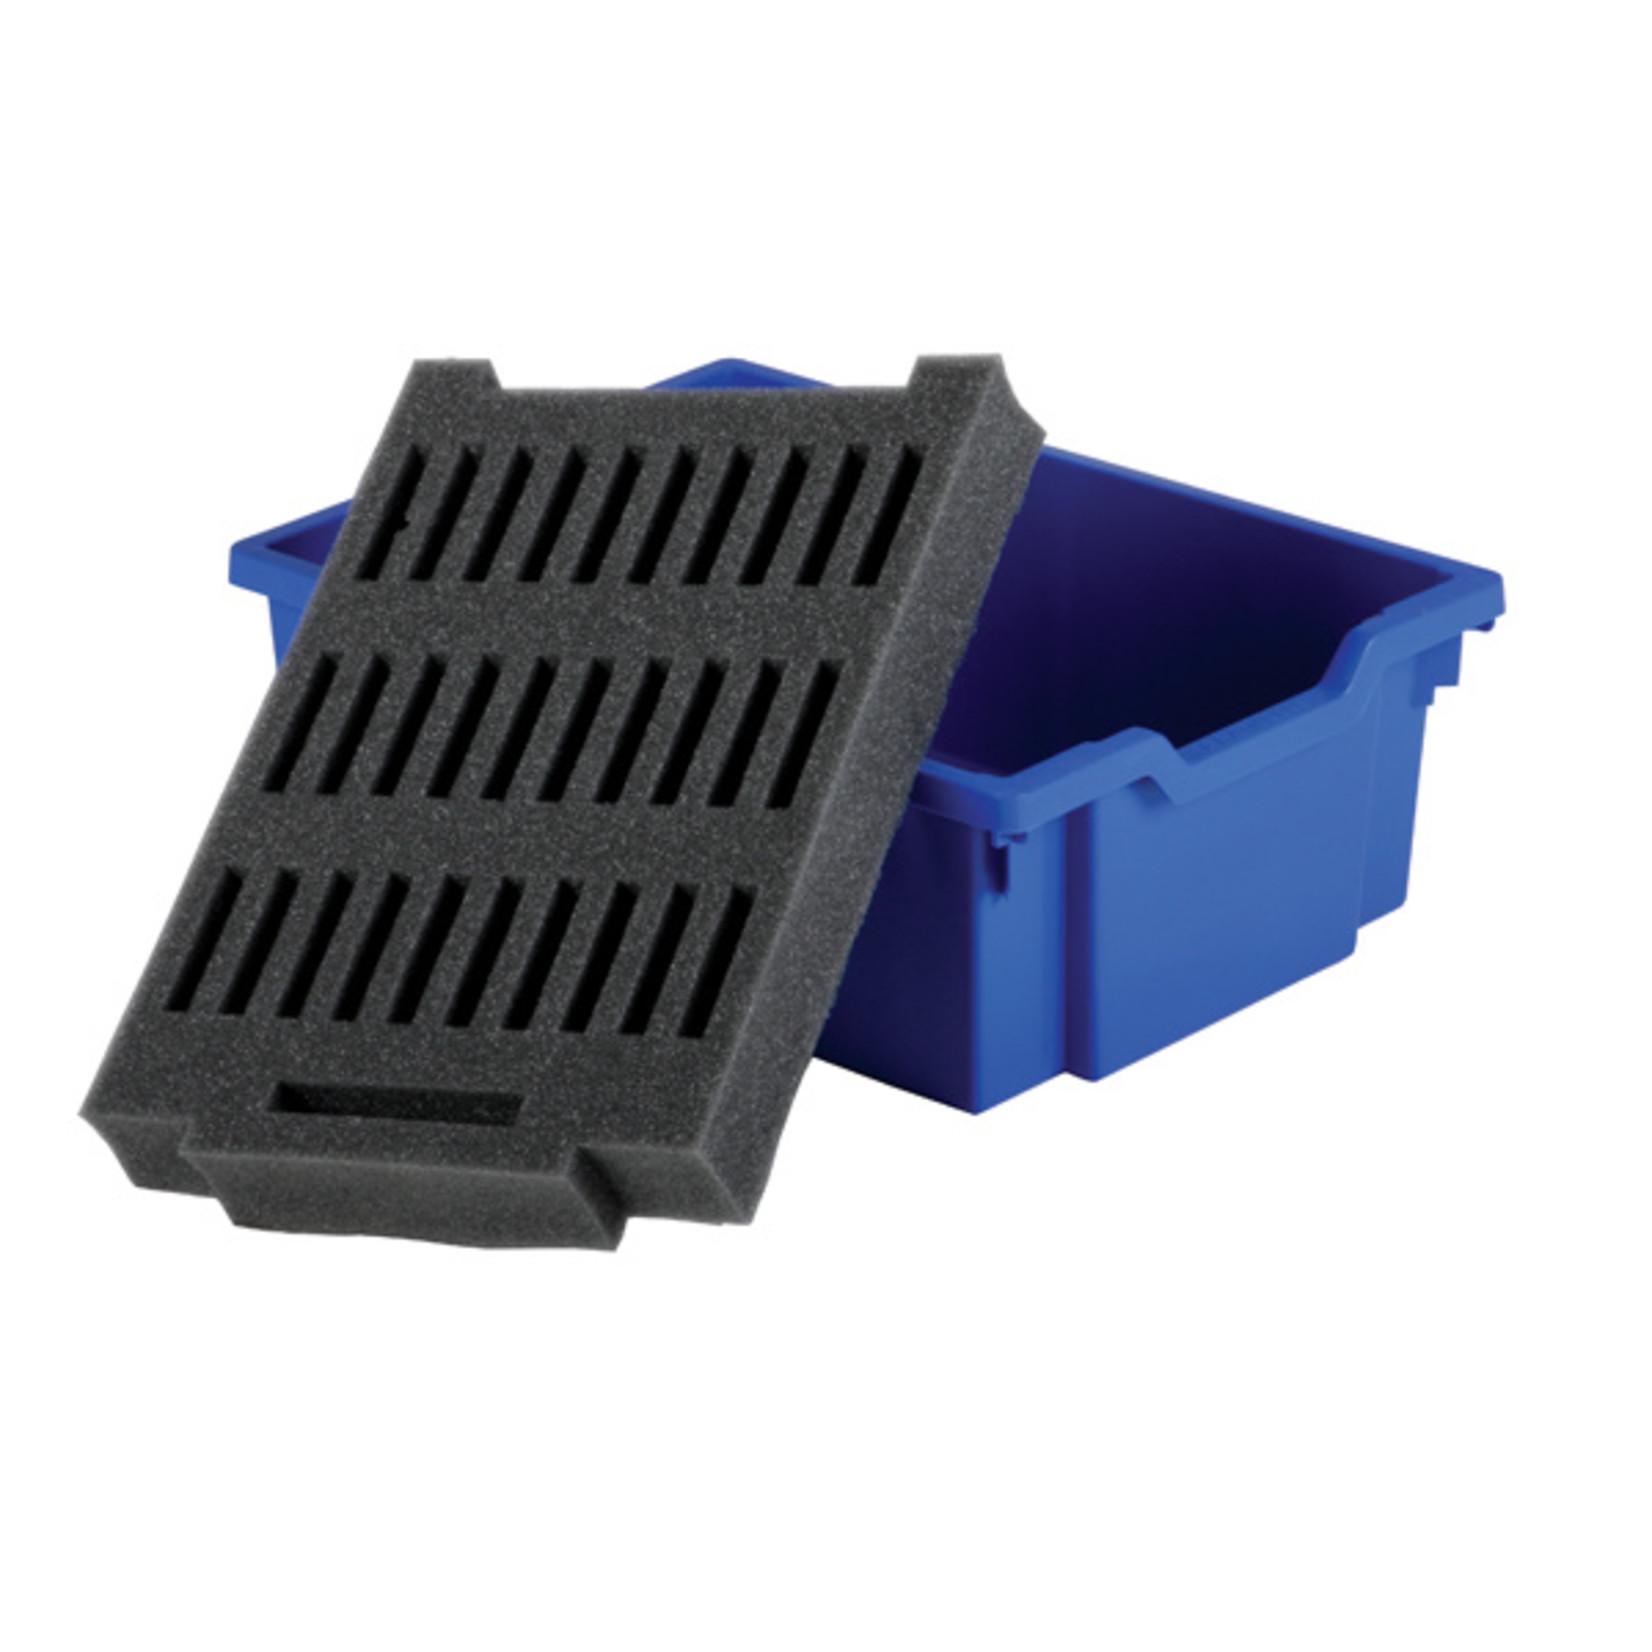 Gratnells Foam Insert 30 + 1 (70 x 12mm) - 50mm Standard Foam